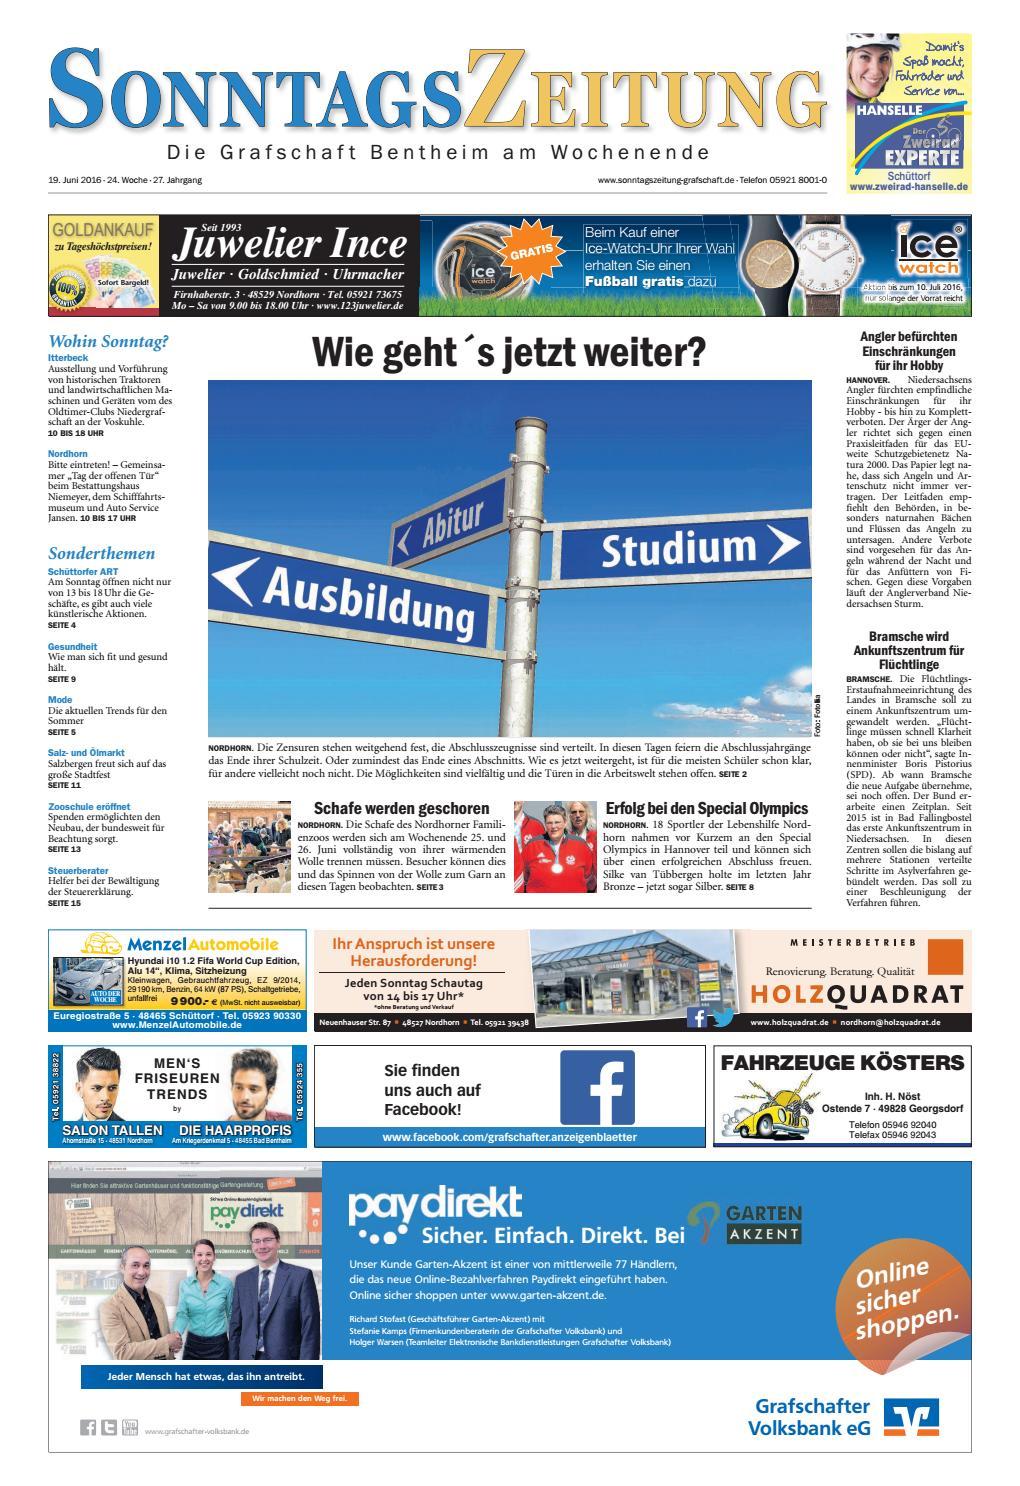 SonntagsZeitung_19.06.2016 by SonntagsZeitung - issuu